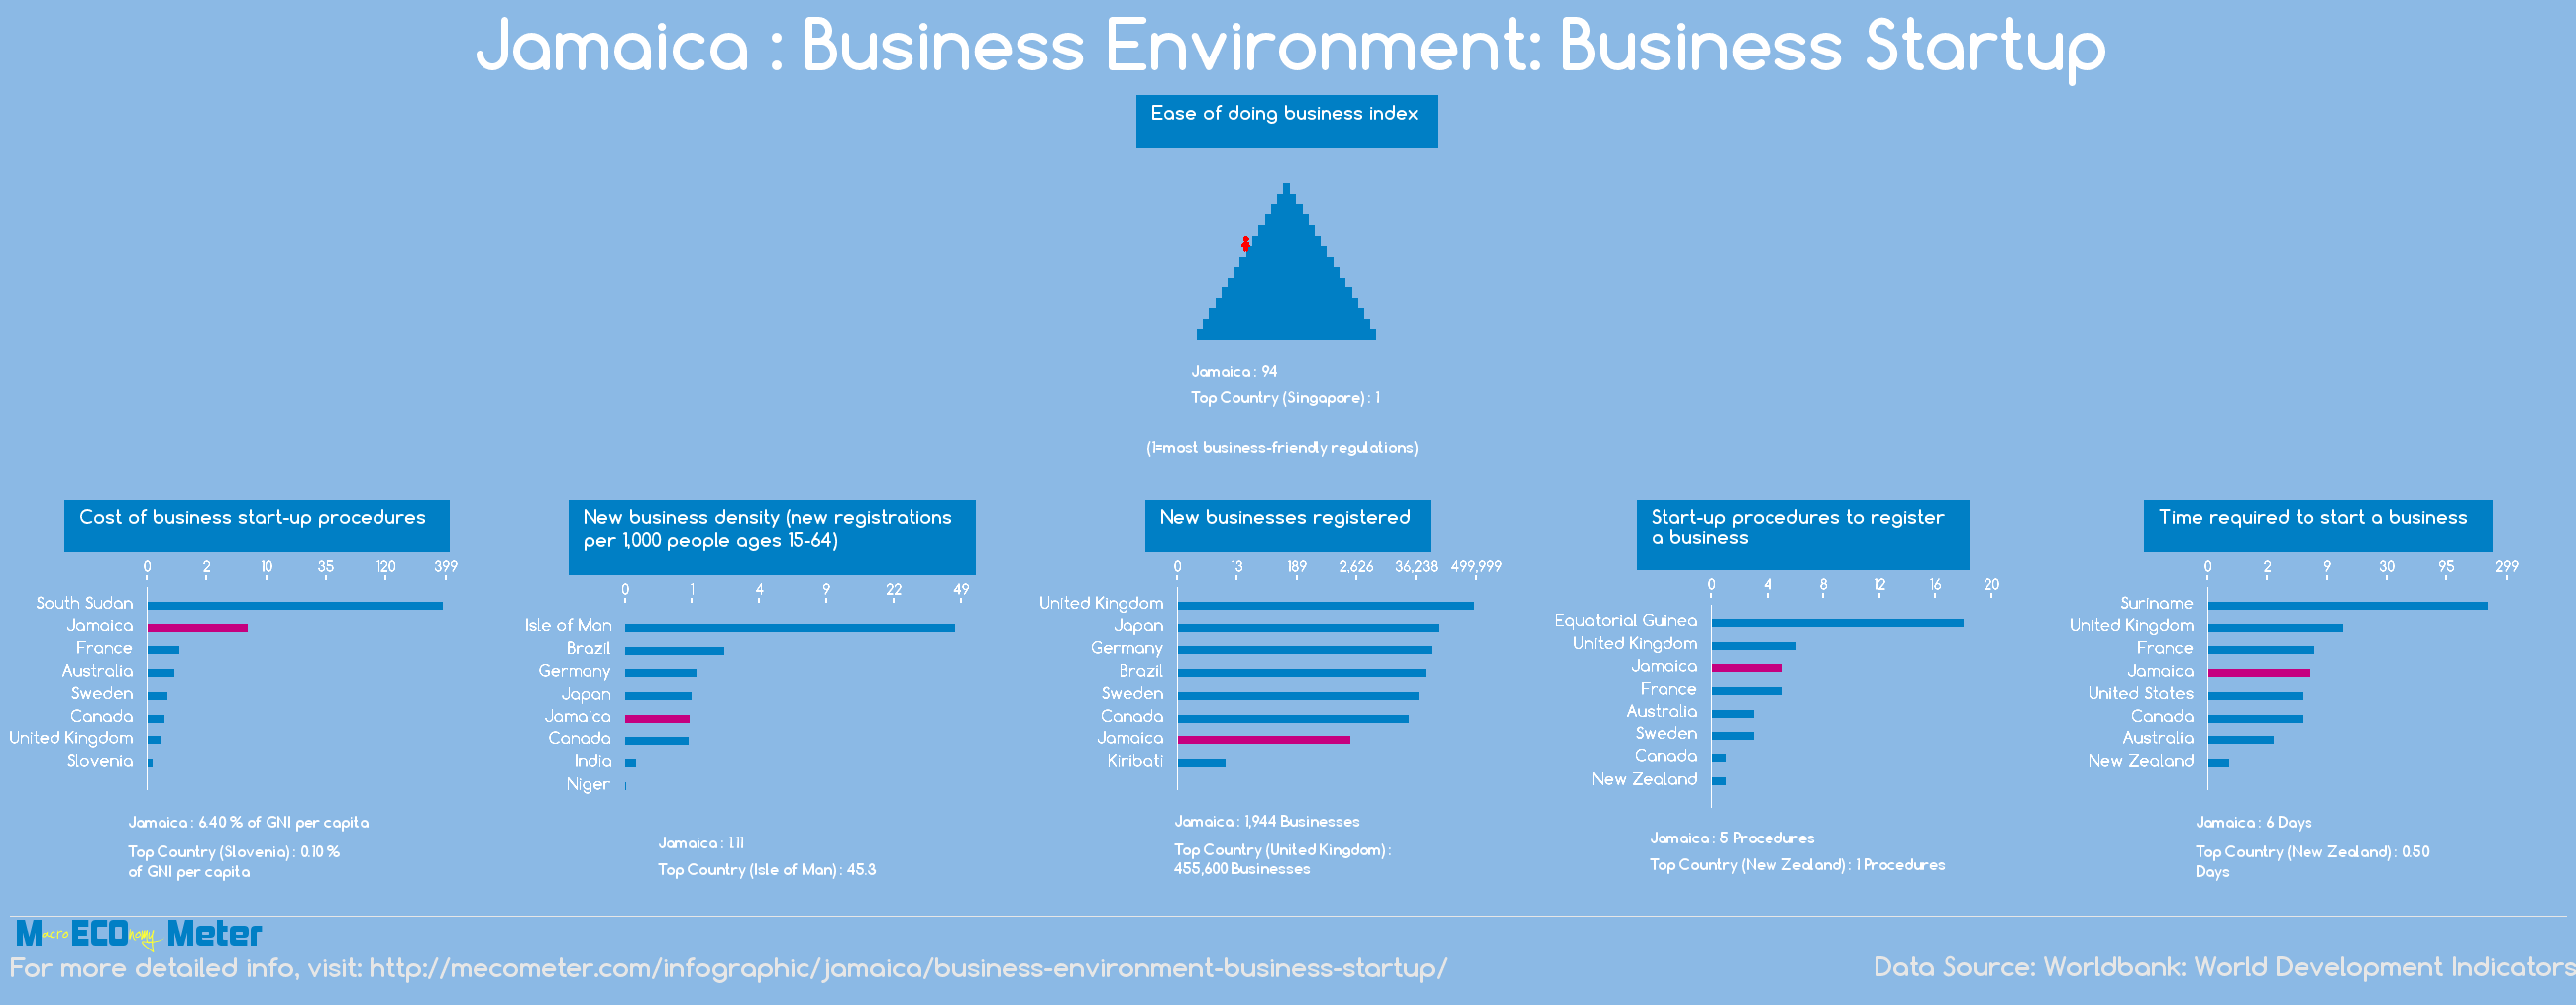 Jamaica : Business Environment: Business Startup